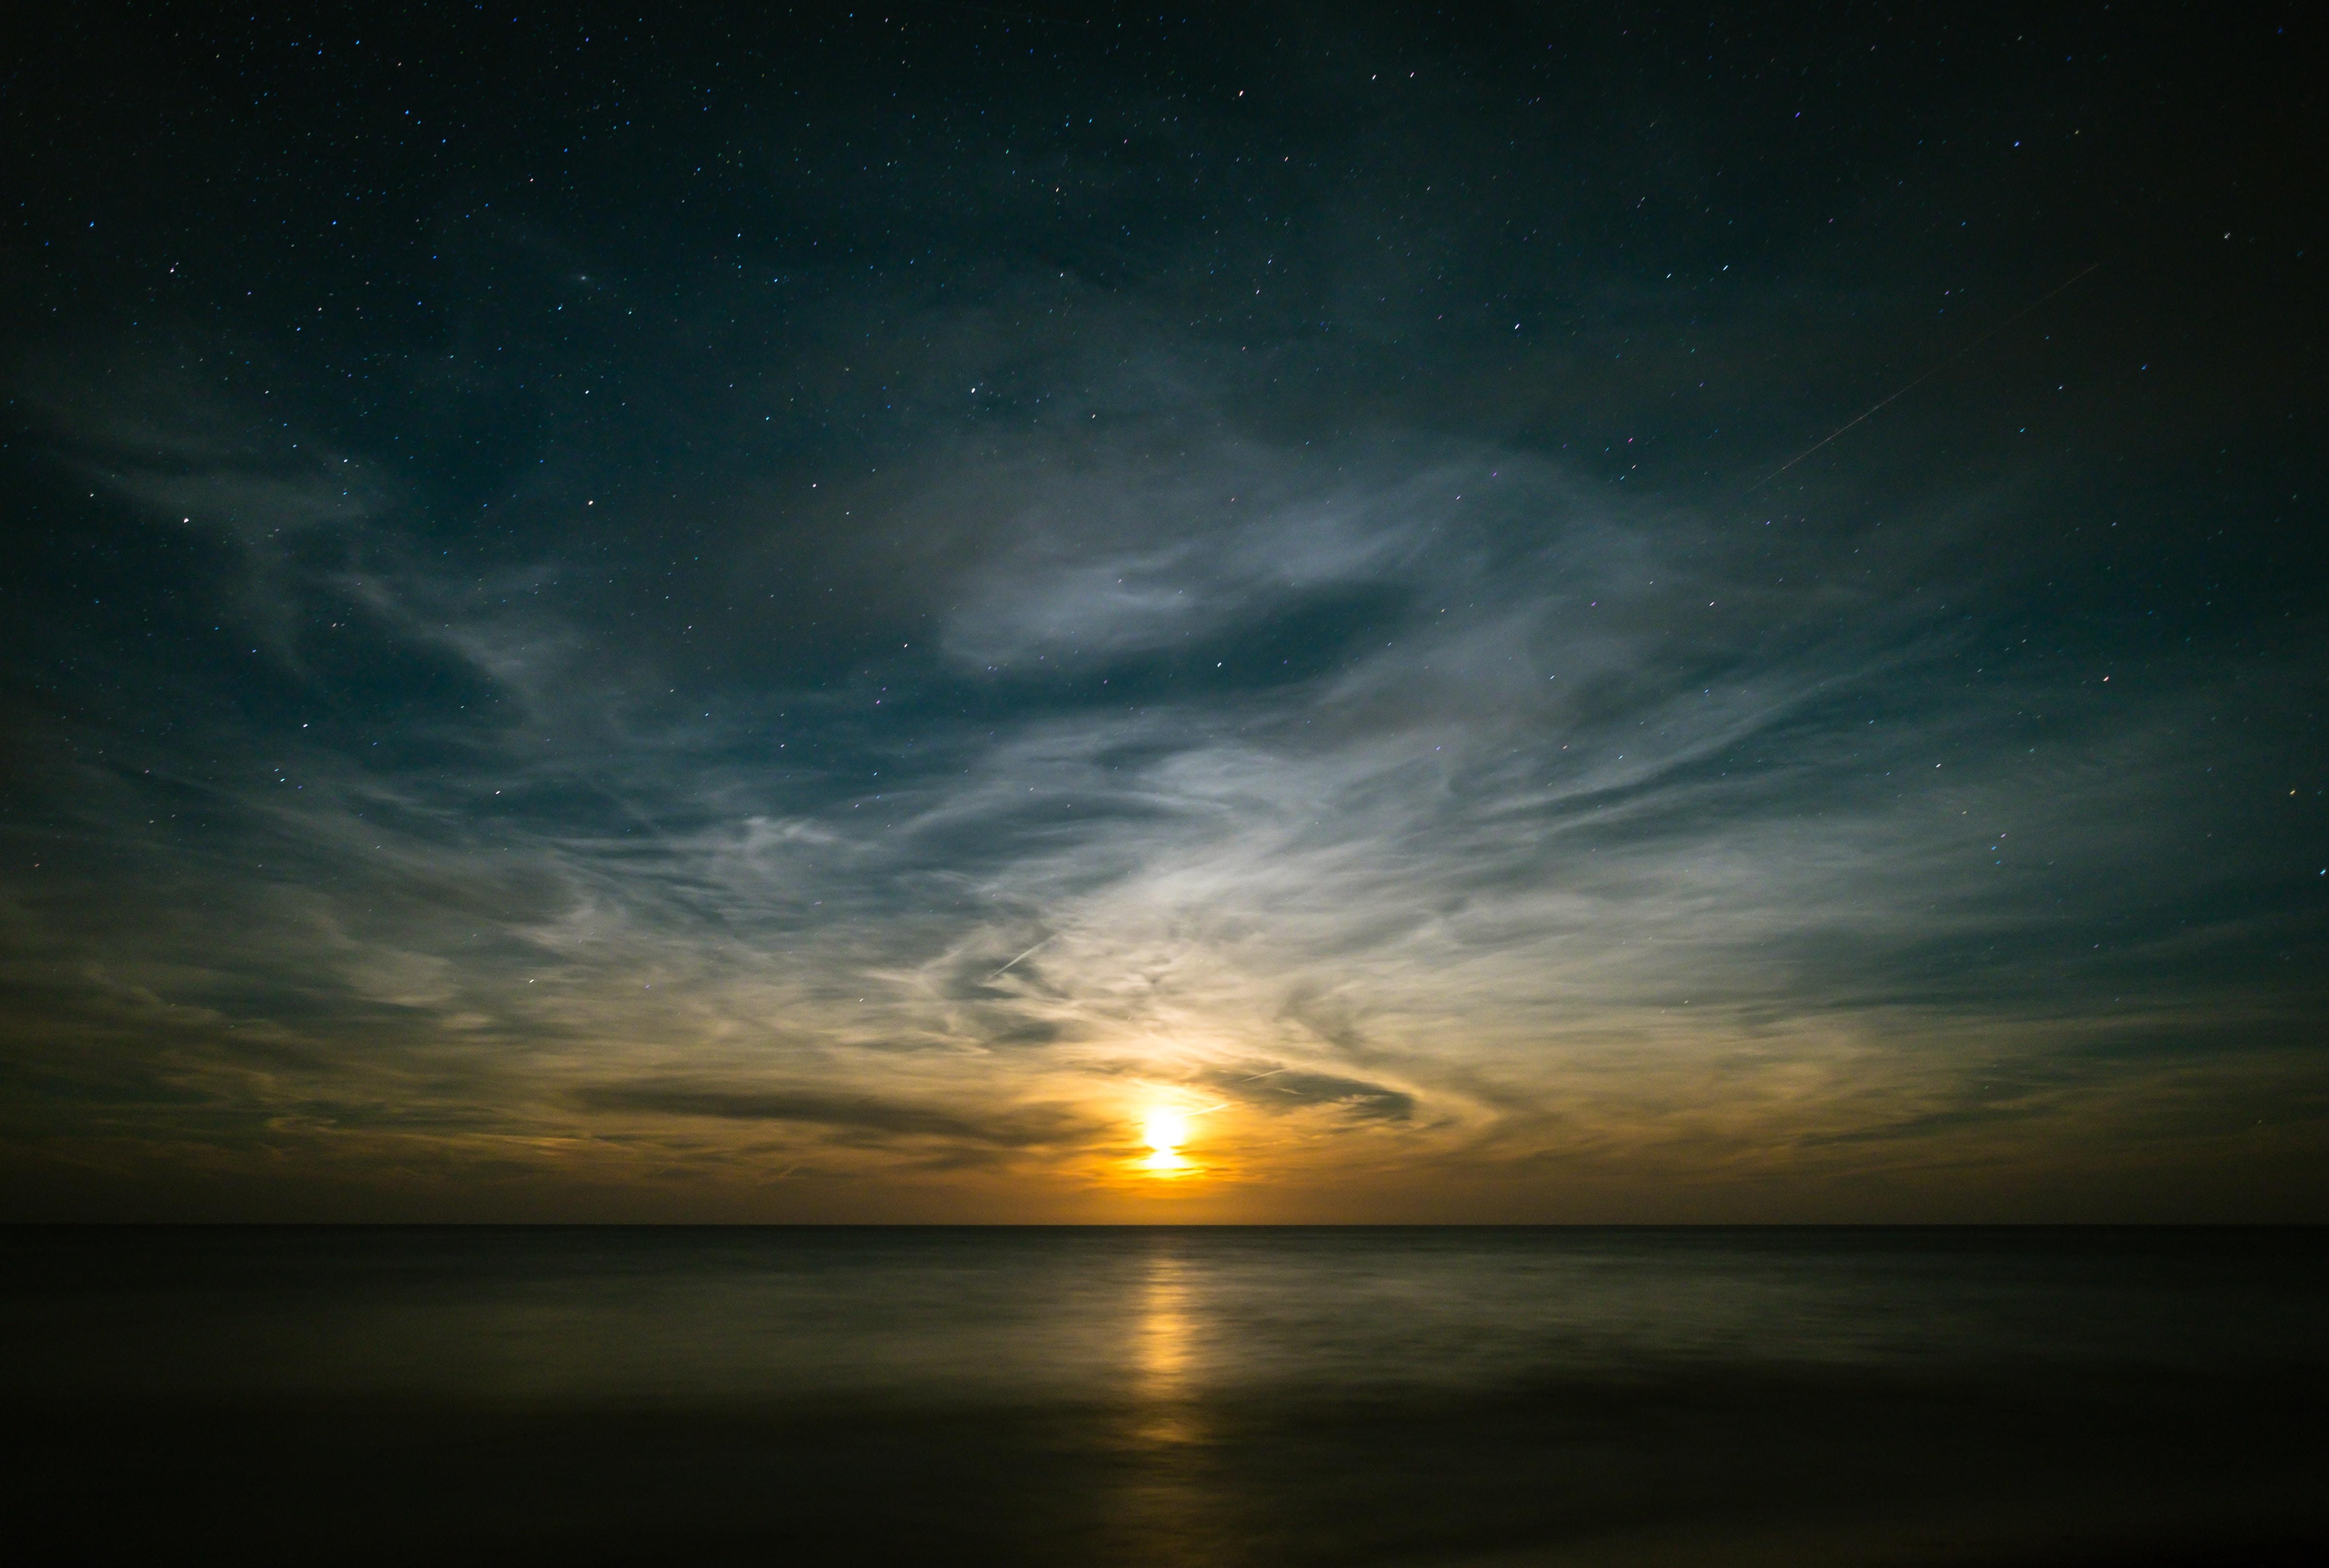 Sun ☀️  alone stories